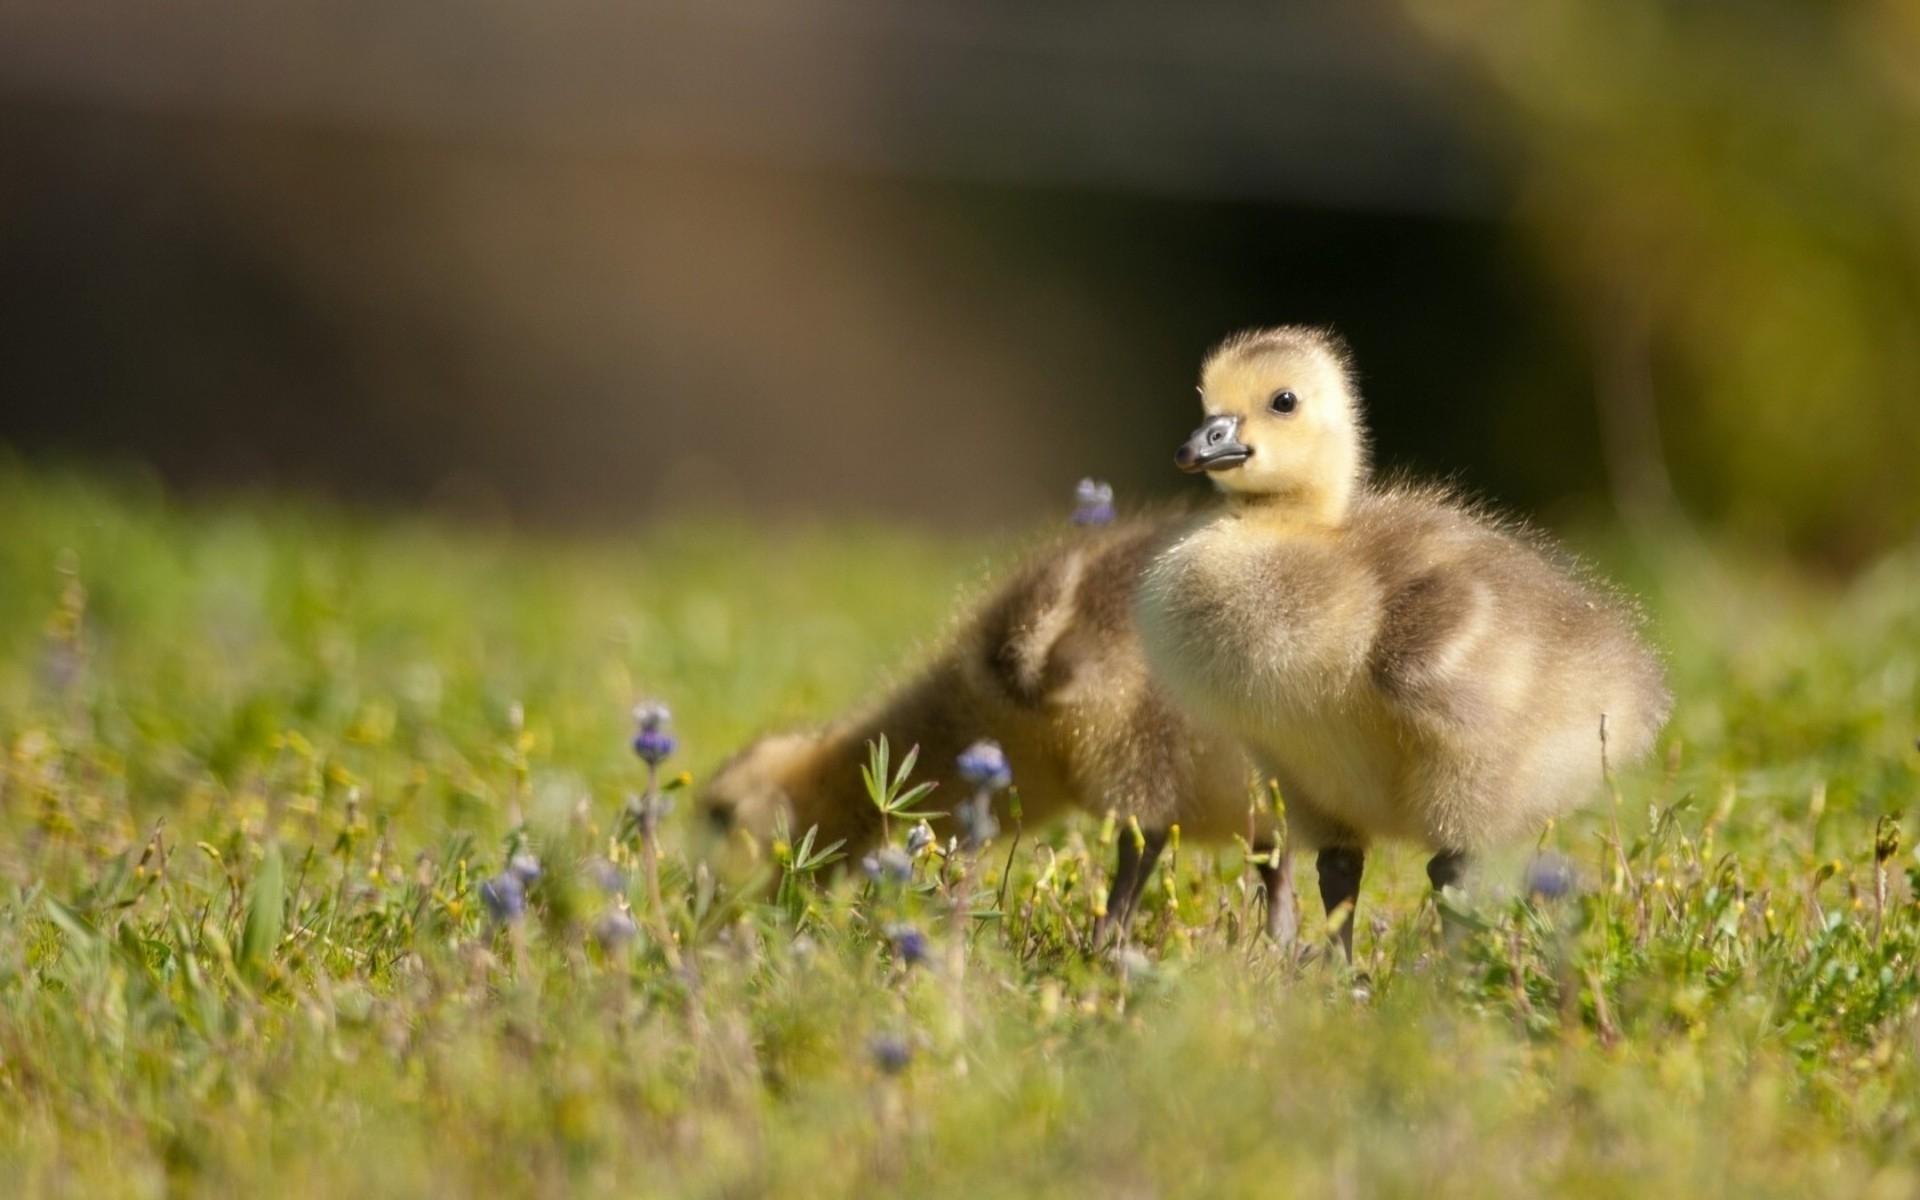 Wallpaper : birds, nature, grass, wildlife, duck, kids, ducklings ...